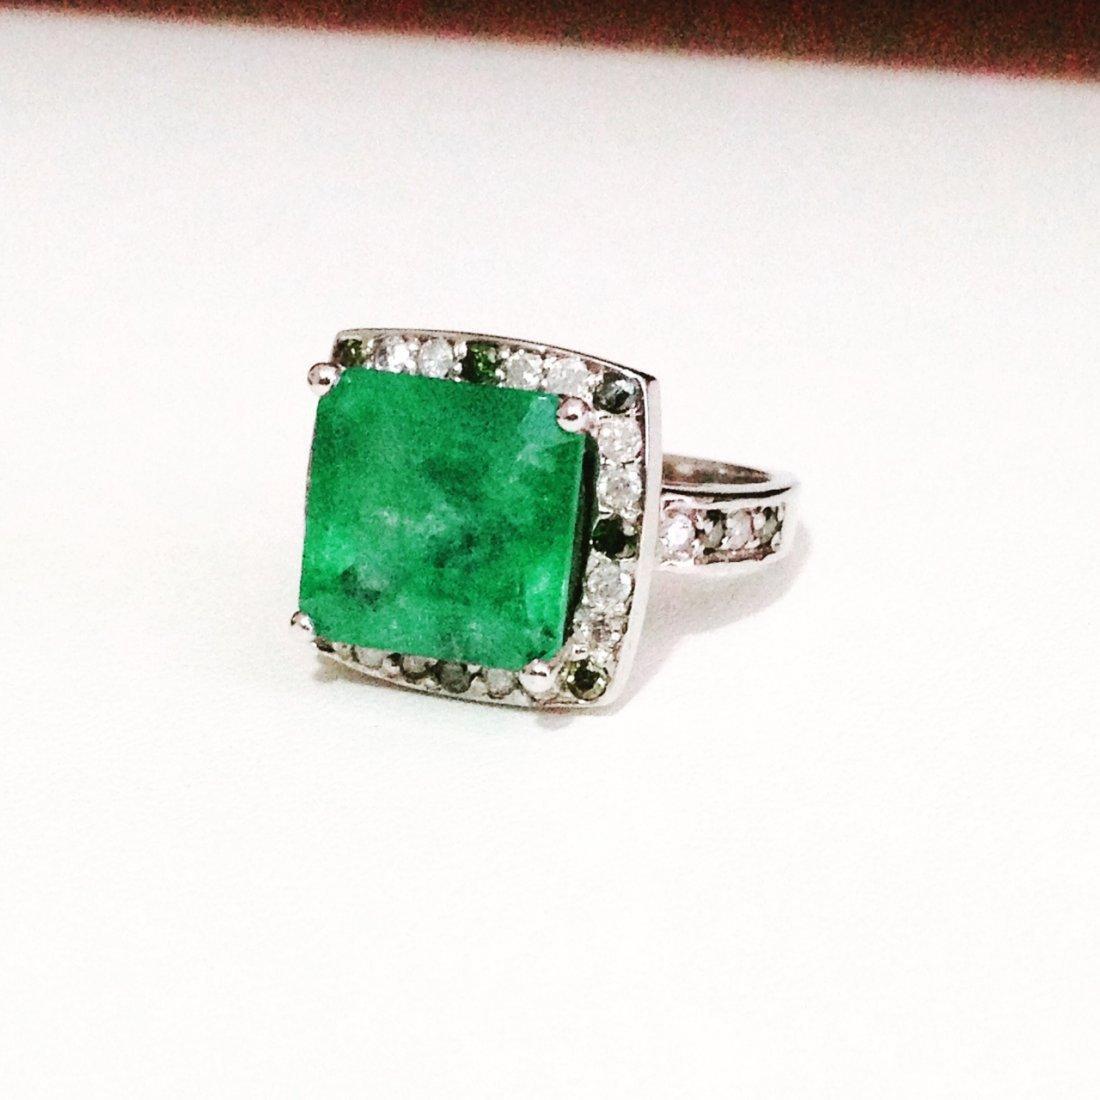 7.5 ct Emerald Ring , White and Green Diamonds